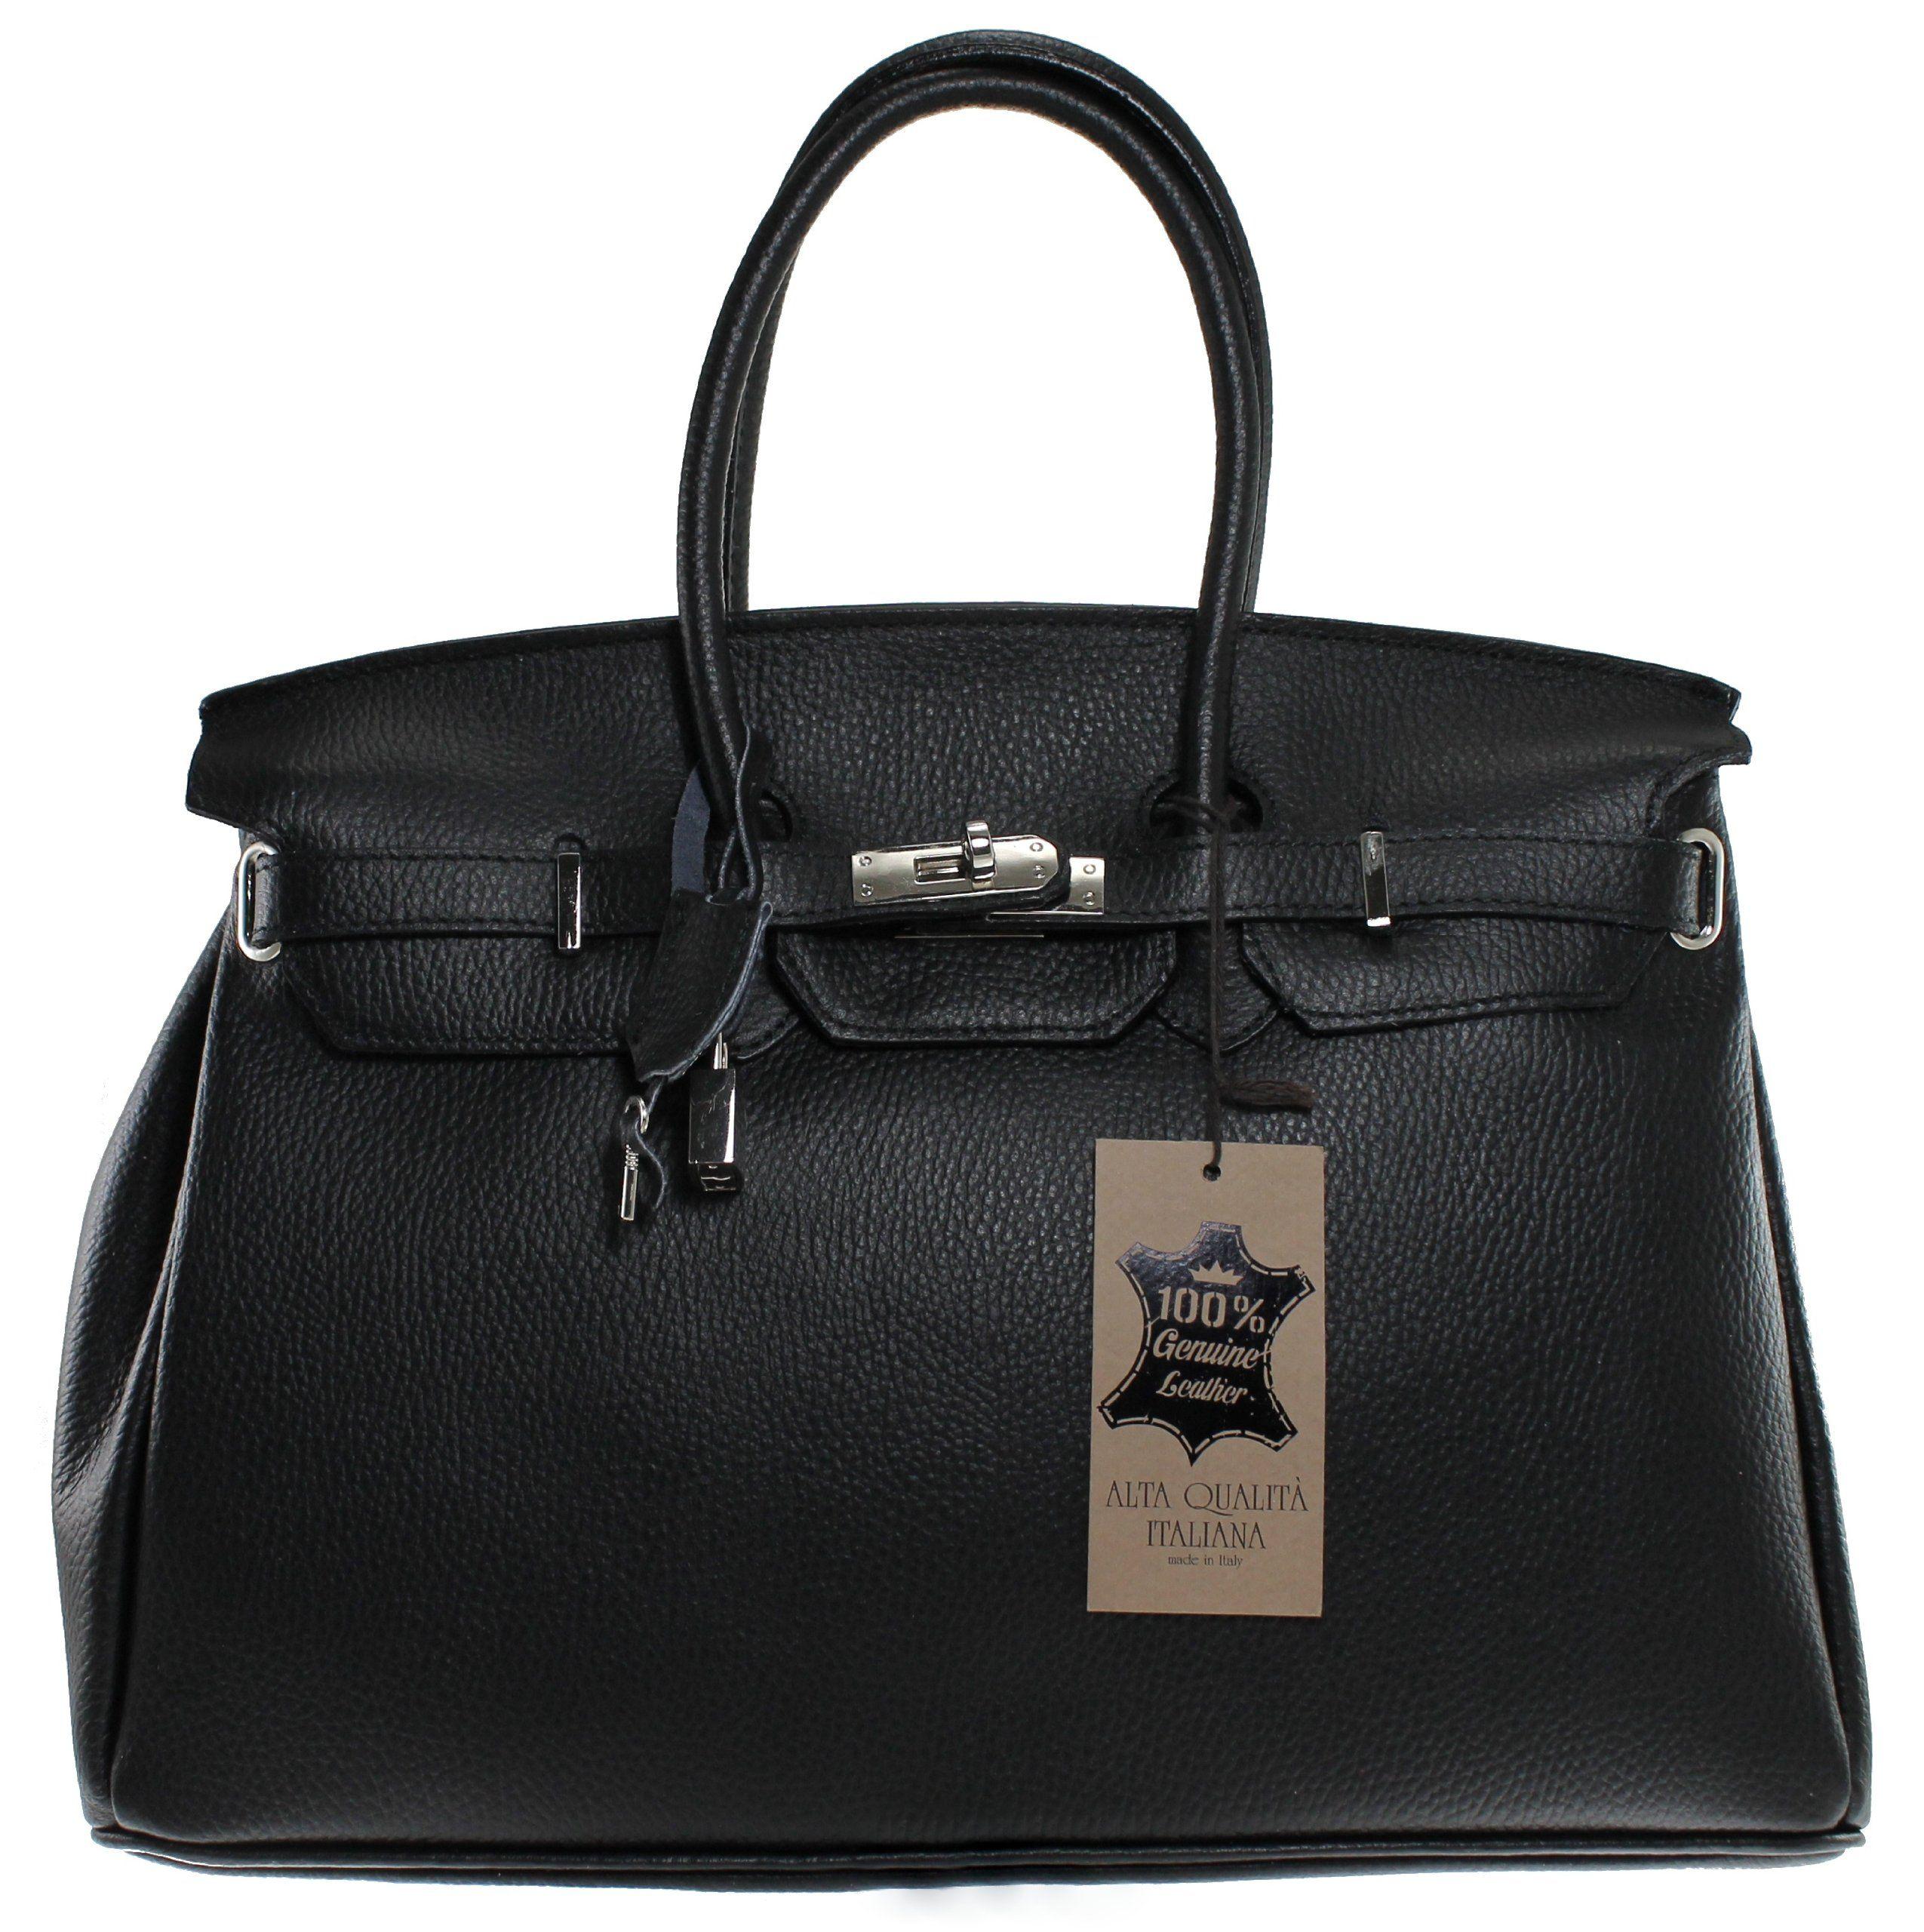 BORSA MODELLO BIRKIN IN VERA PELLE   BORSE   Bags, Hermes